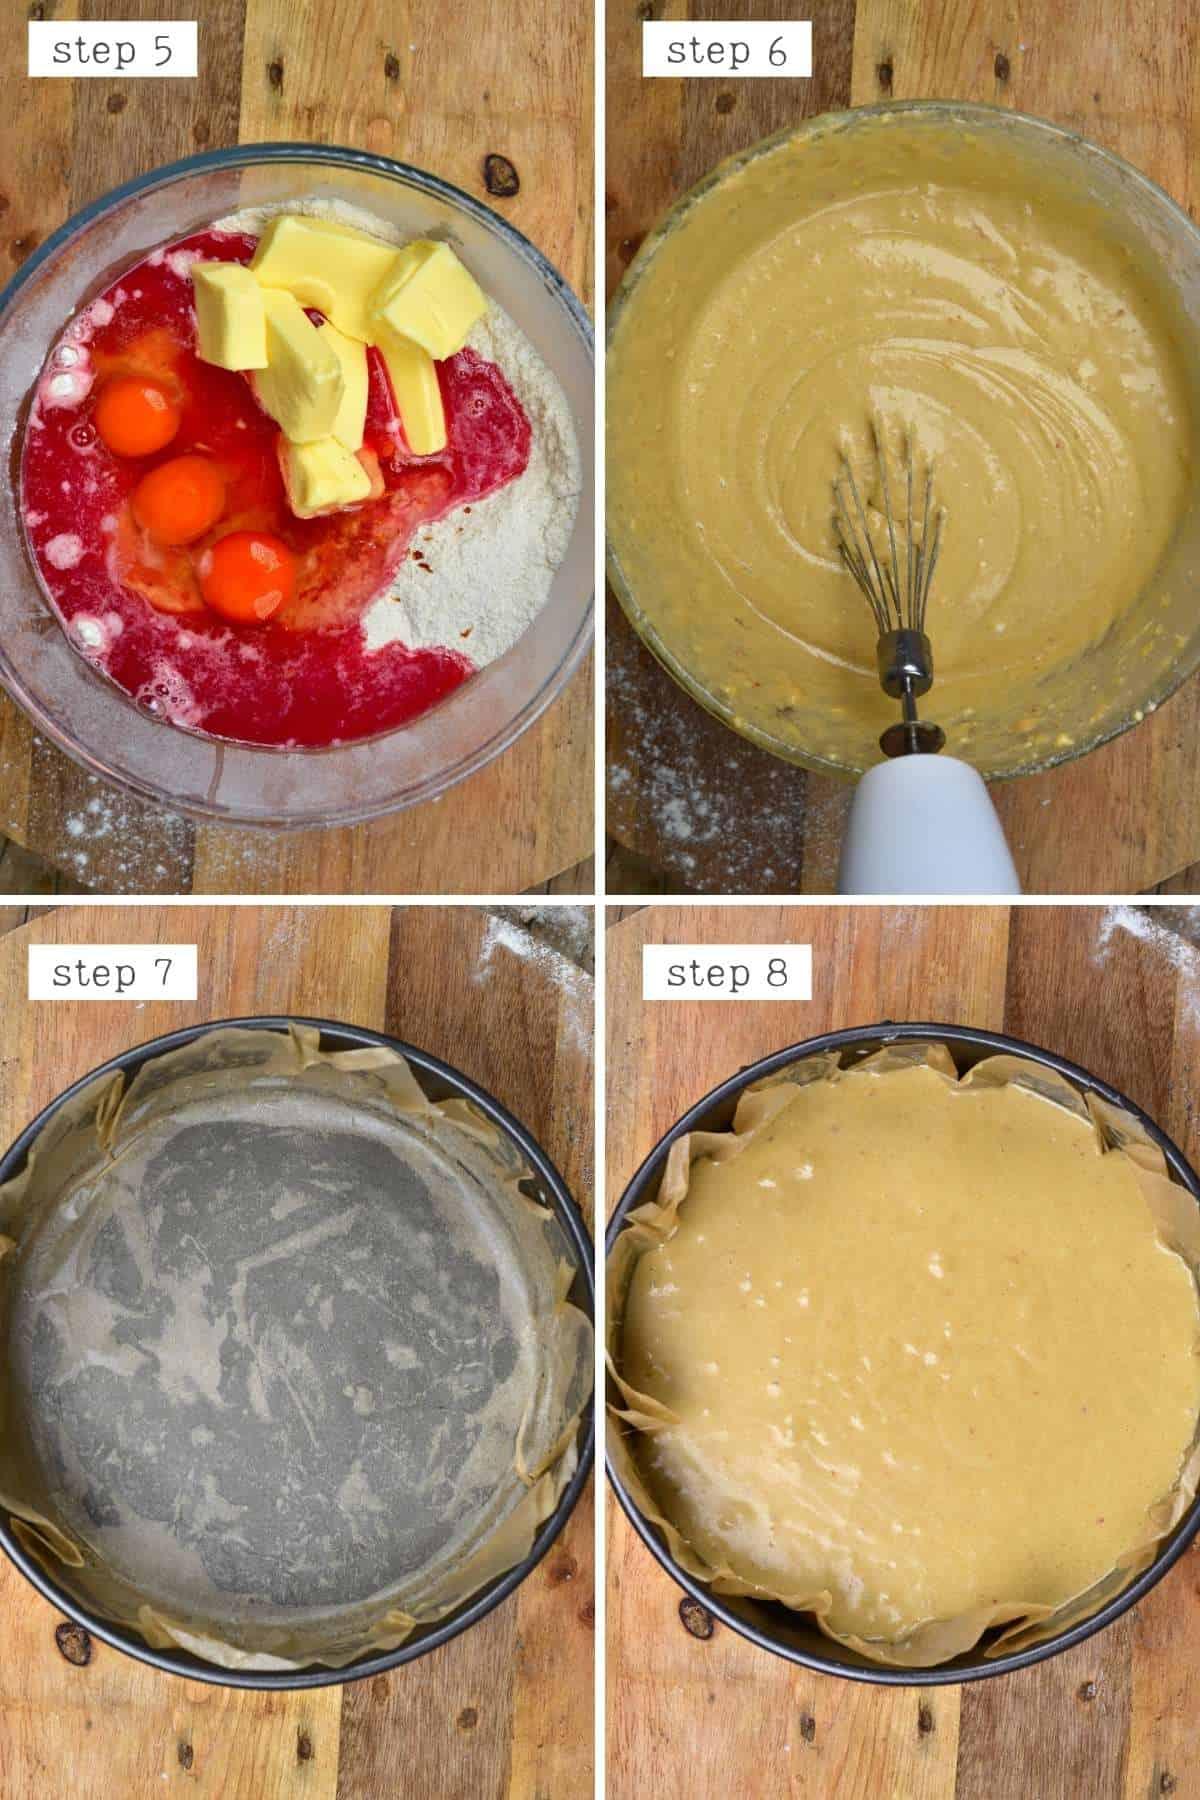 Steps for mixing orange cake batter